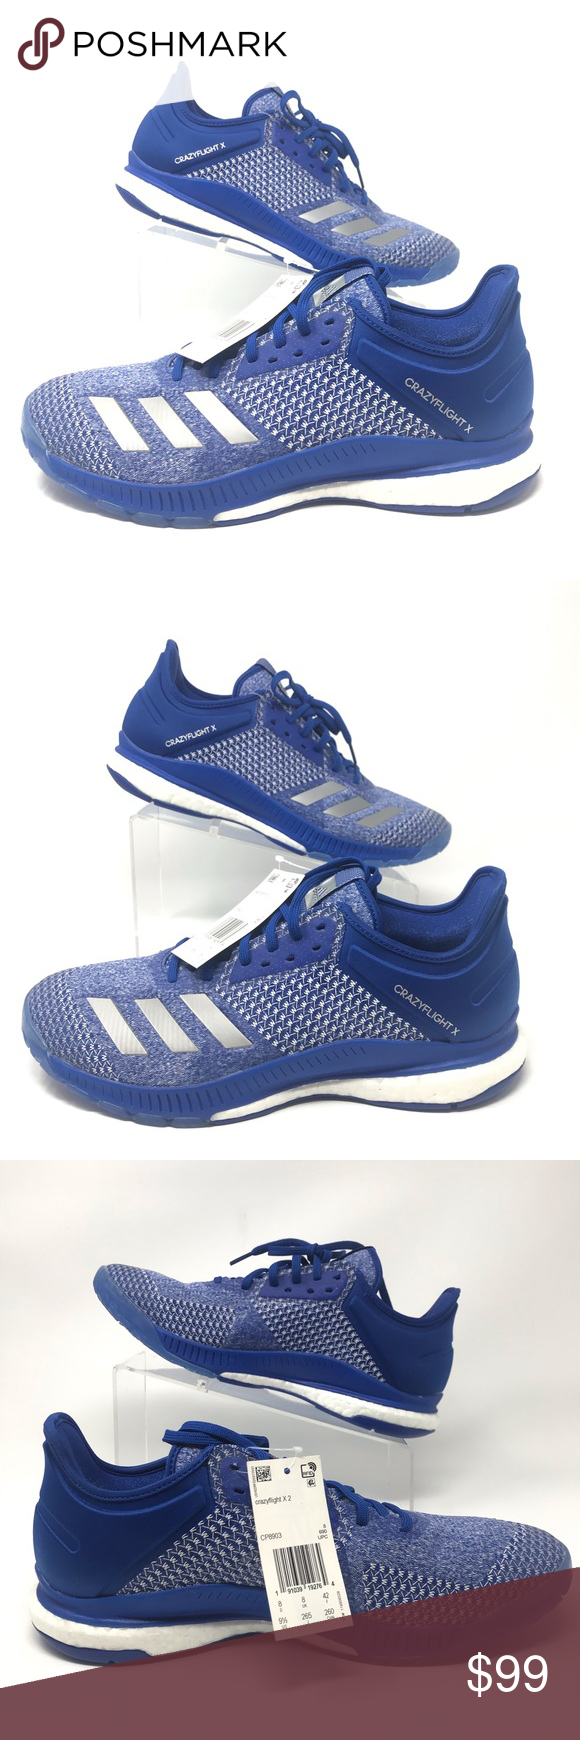 Adidas Crazyflight X Women S Volleyball Shoes Sz 9 5 Women S Volleyball Shoes Adidas Crazyflight X Adidas S Adidas Women Volleyball Shoes Shoes Sneakers Adidas